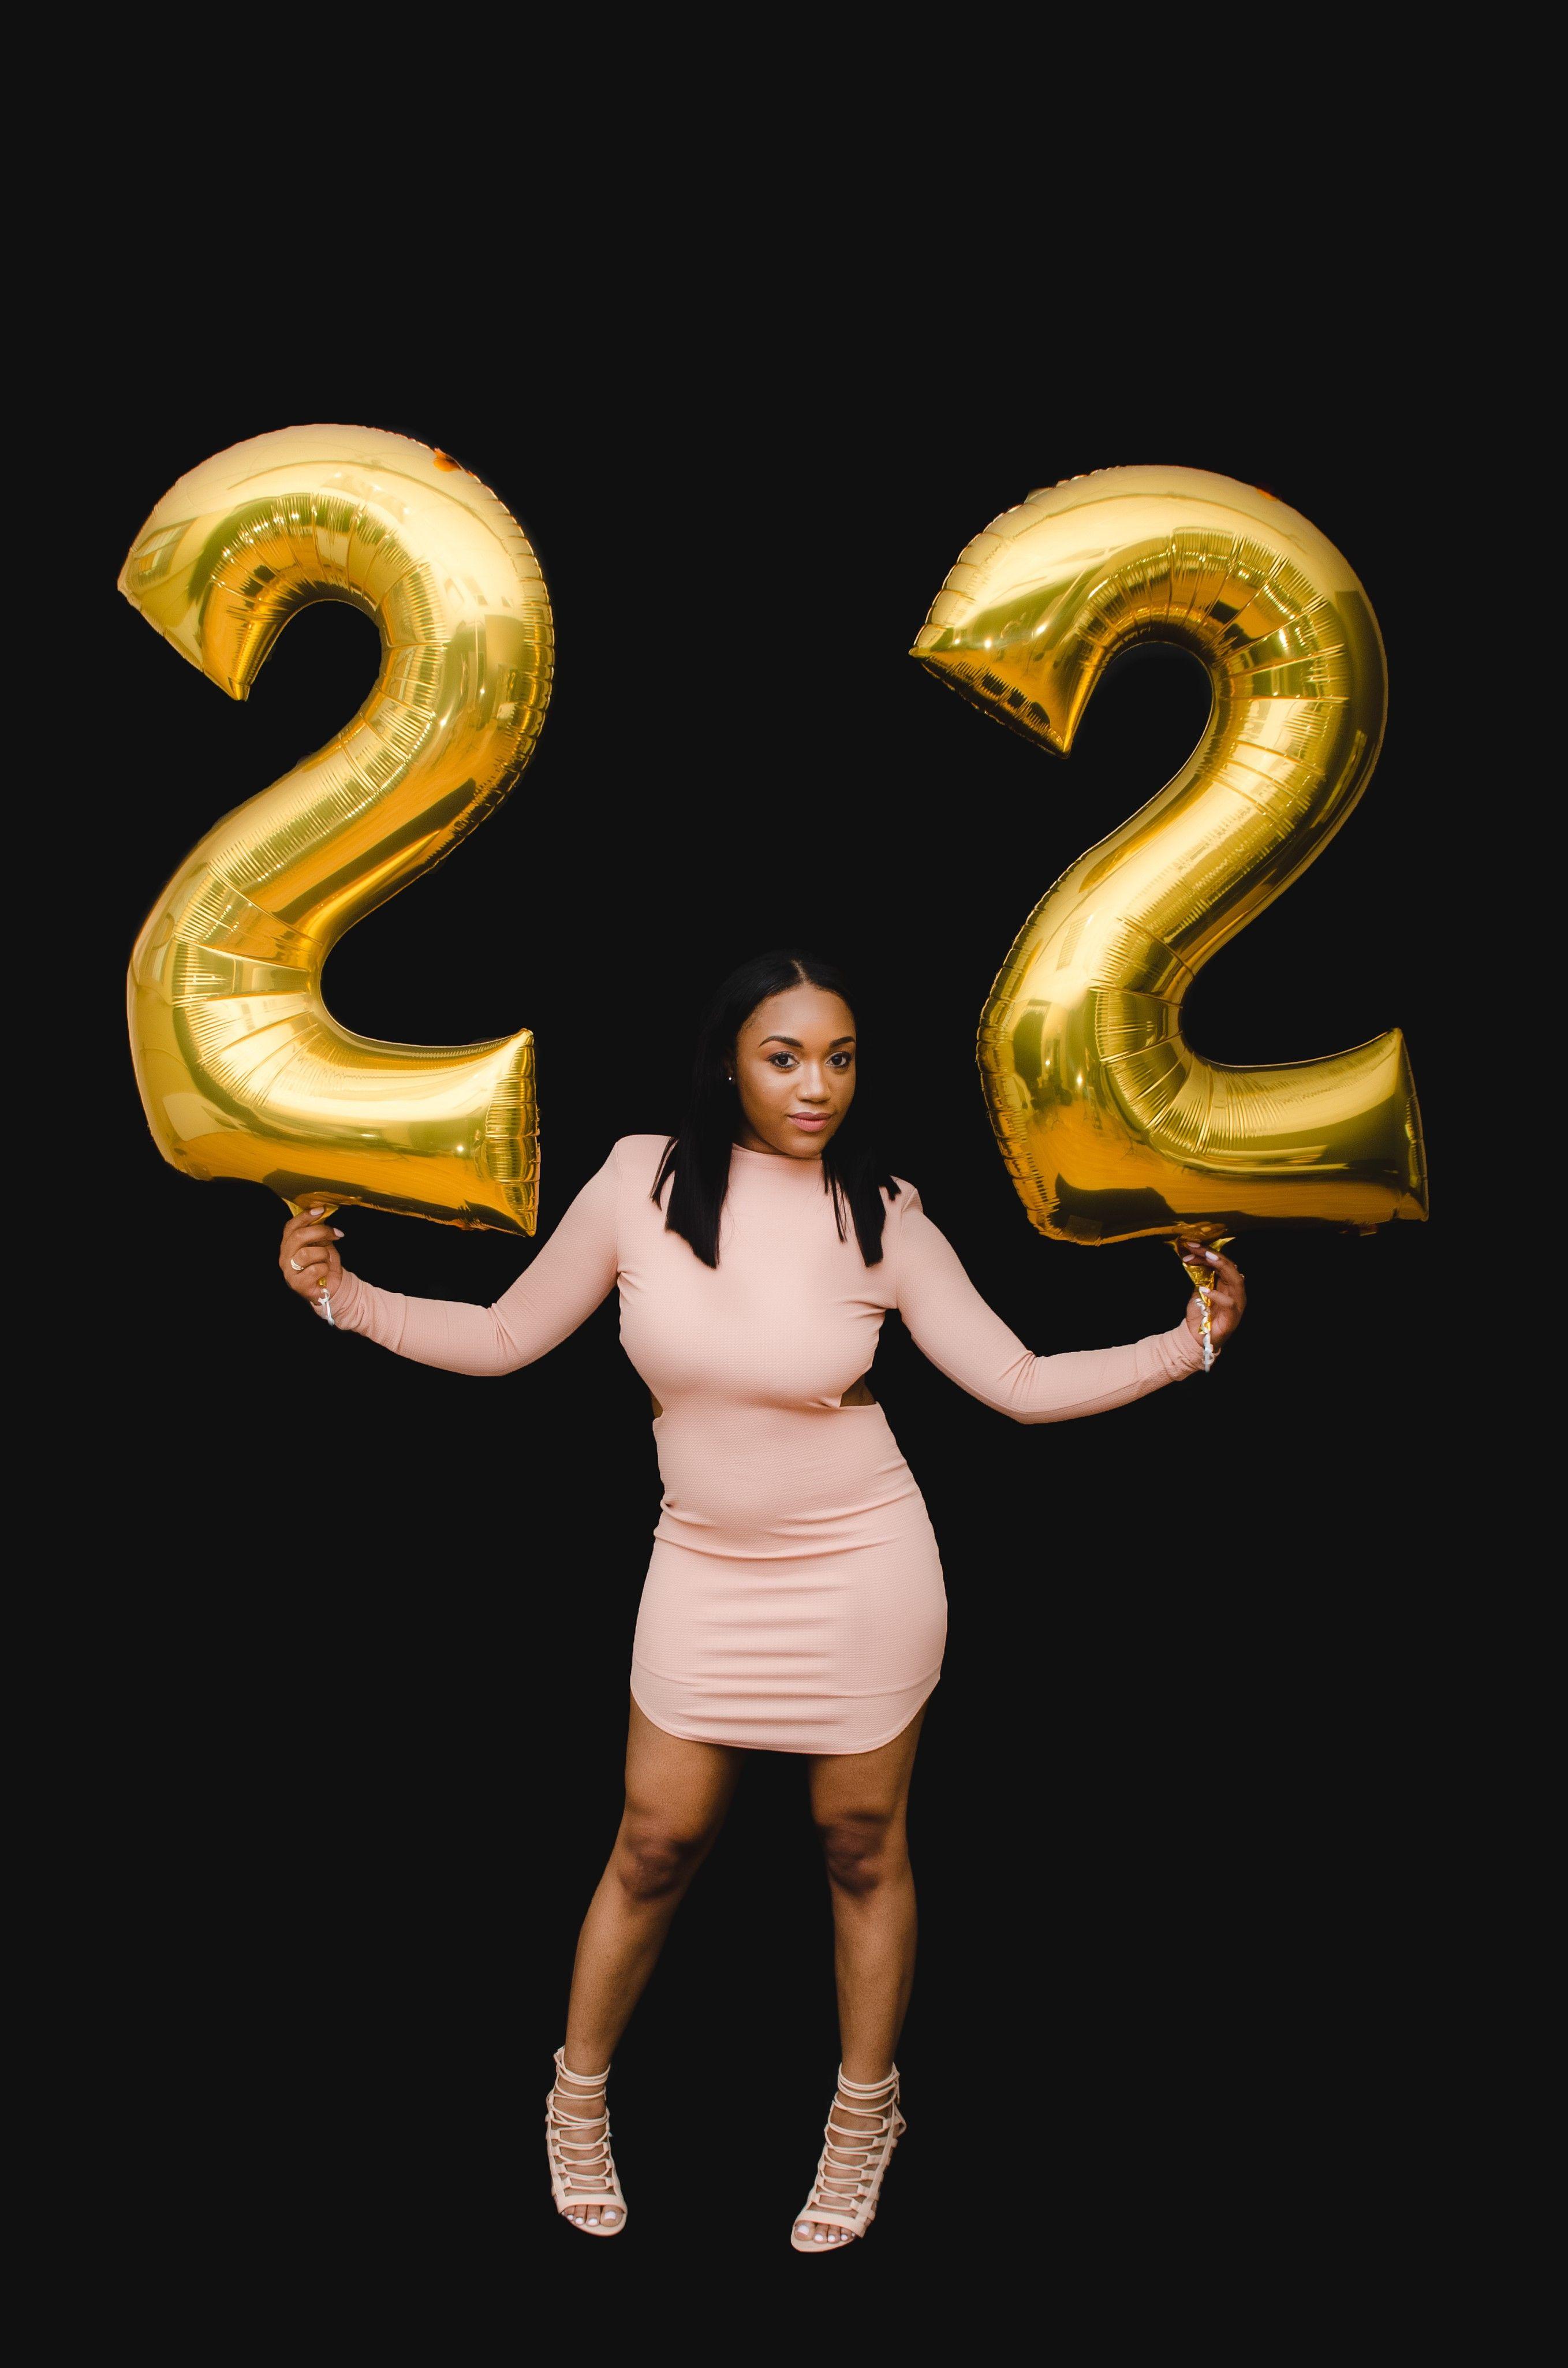 Pinterest Amacias3875 Birthdays In 2019 Birthdays